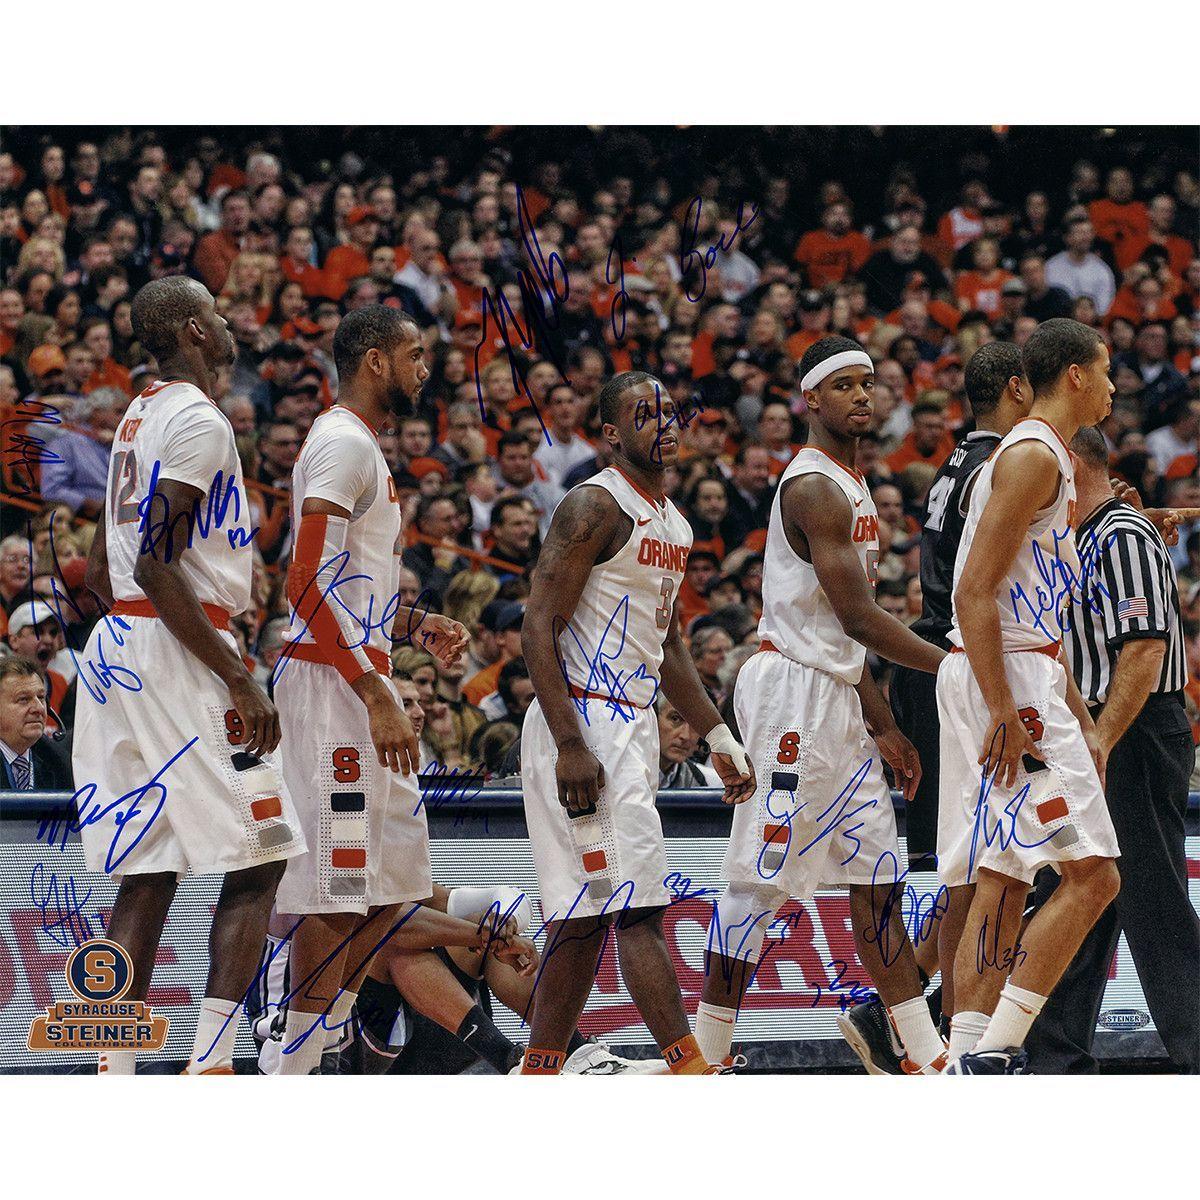 Syracuse Basketball 20112012 Season White Jerseys Team